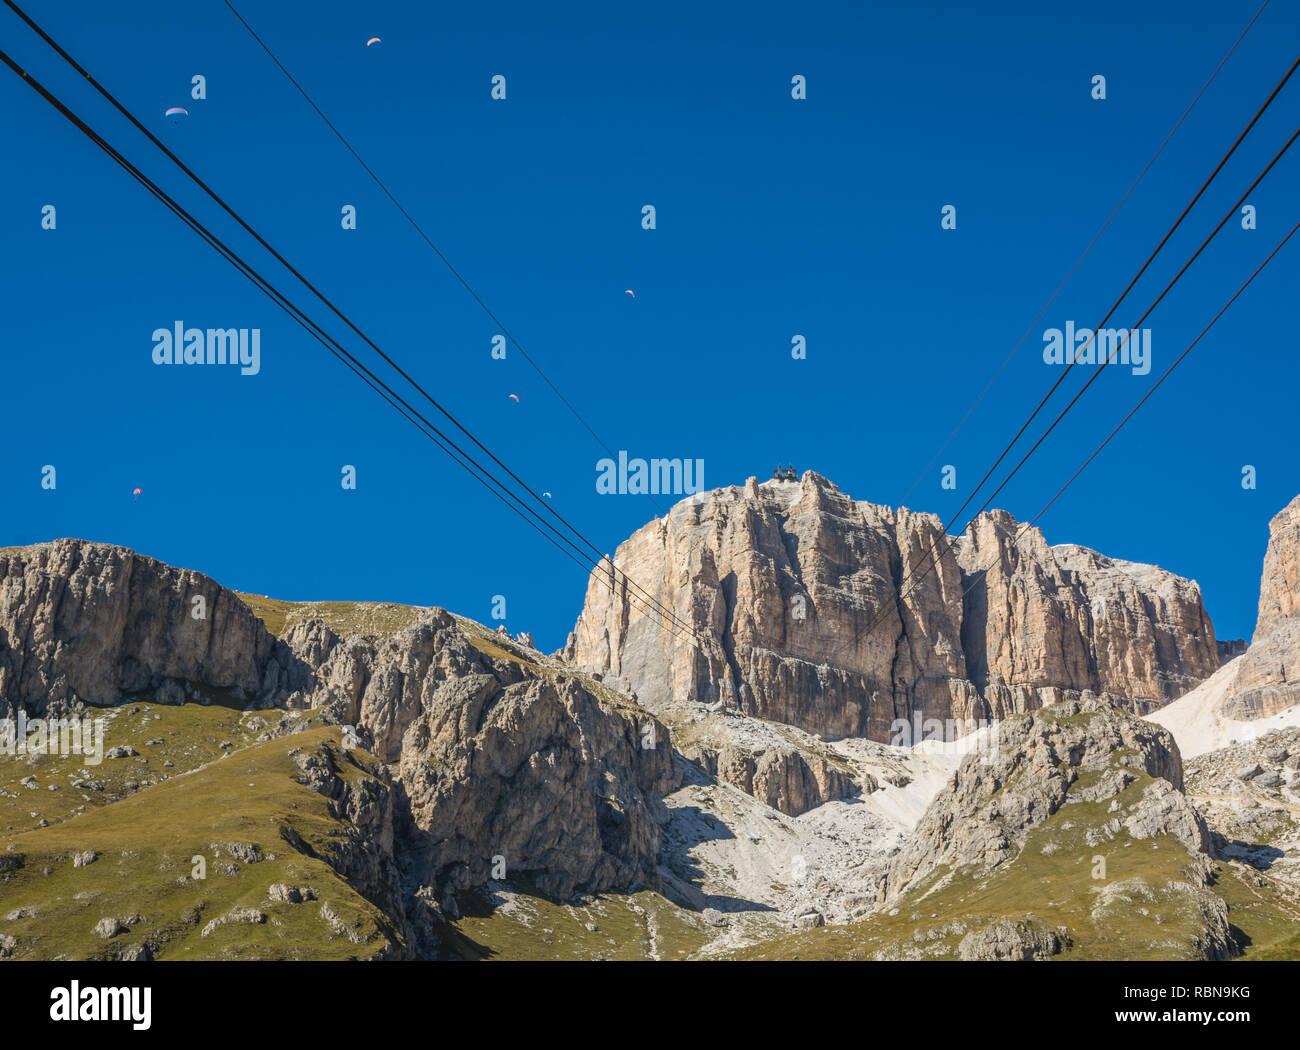 View of the mountain Sass Pordoi from the cable car station on Pordoi Pass, dolomites, Trentino Alto Adige, northern Italy - Stock Image